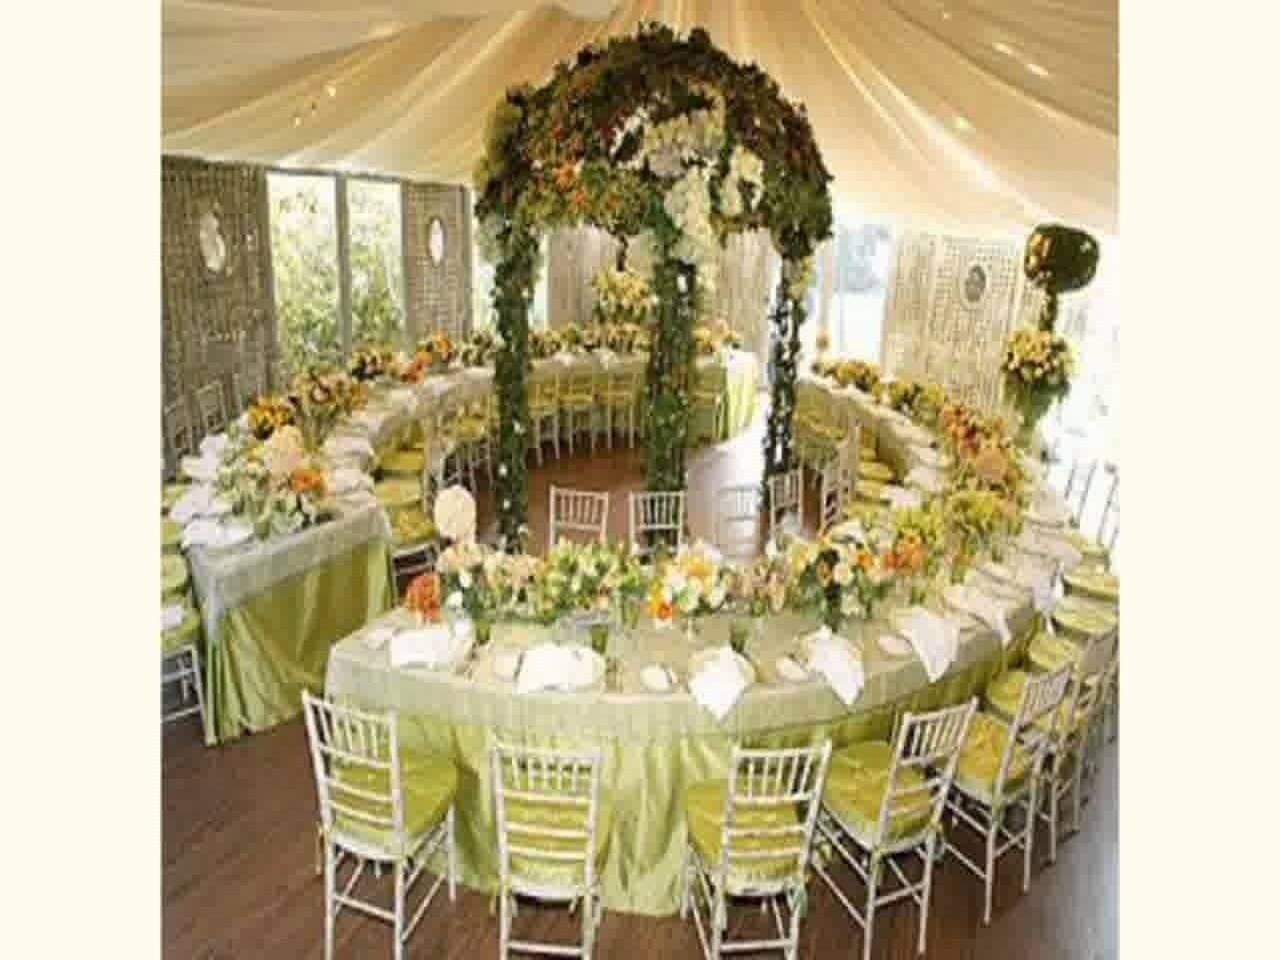 10 Great Wedding Decoration Ideas For Church church wedding decoration ideas 2015 youtube 2020